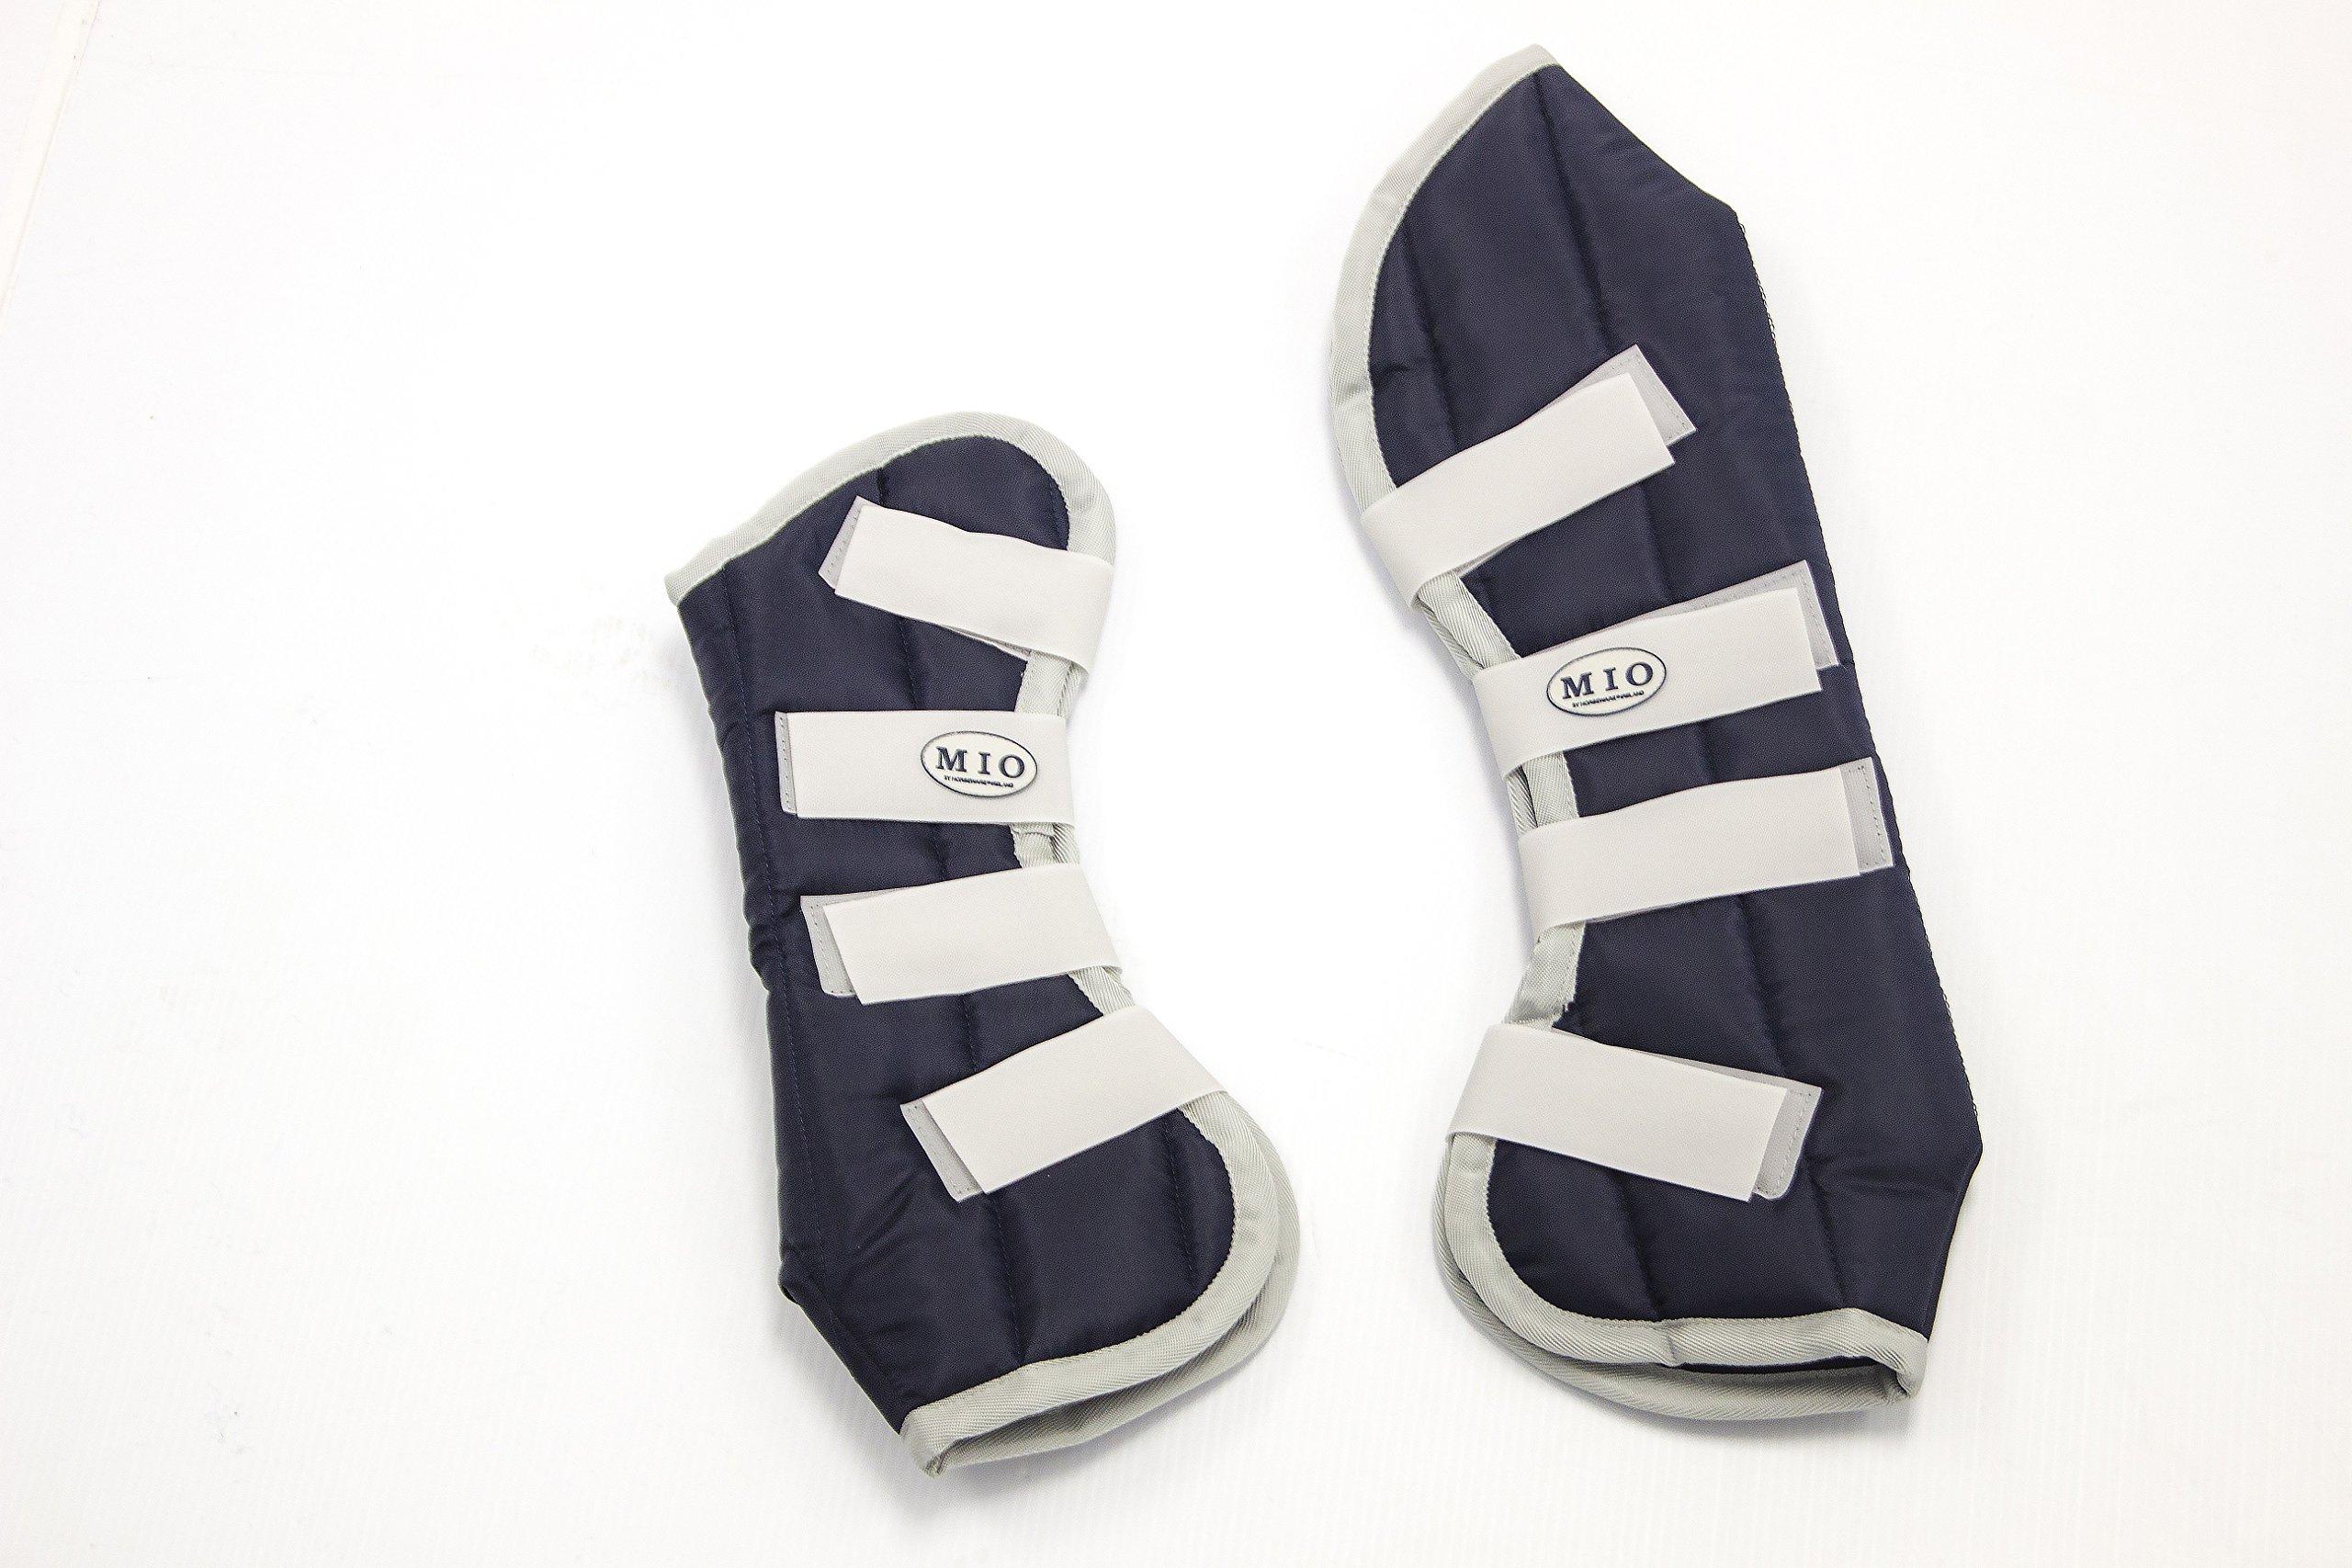 Horseware Mio Travel Boots Navy Cob